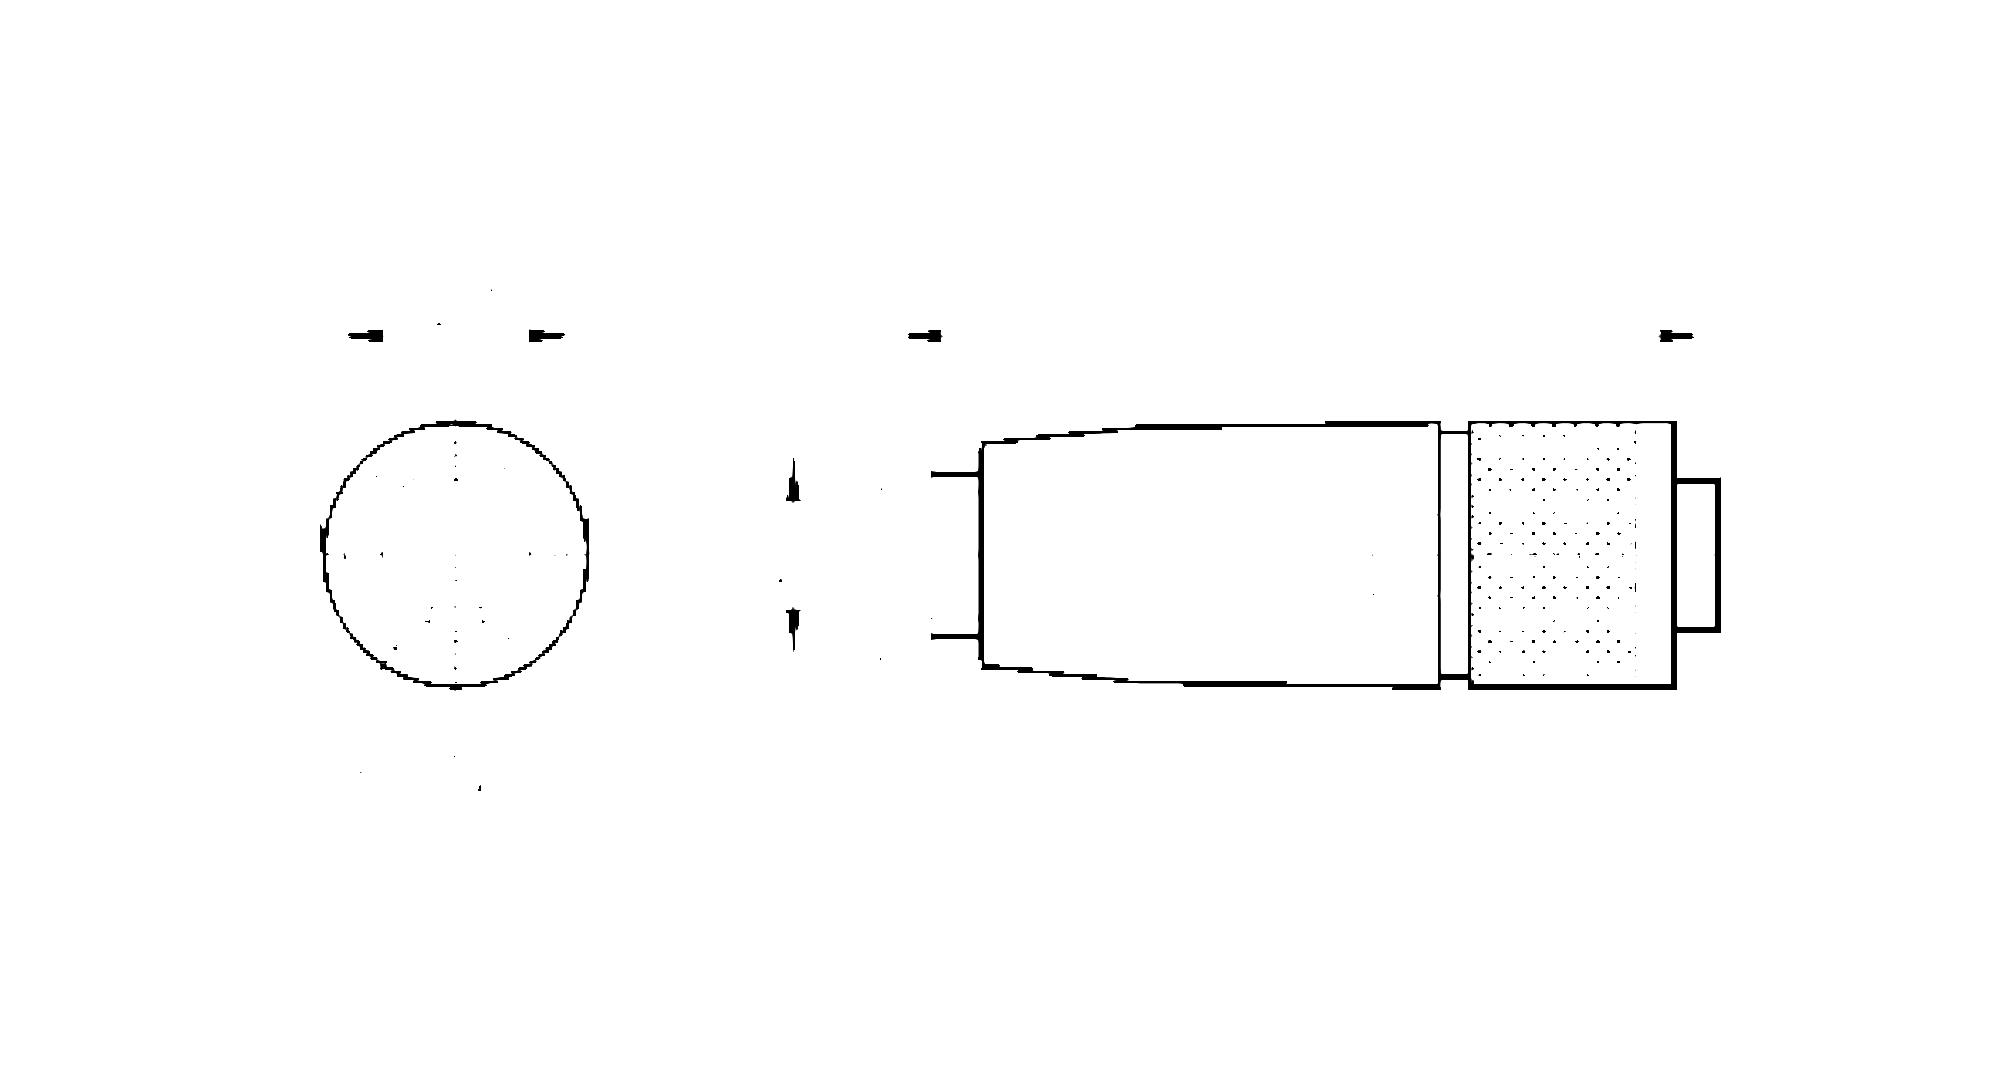 l34115 - wirable socket